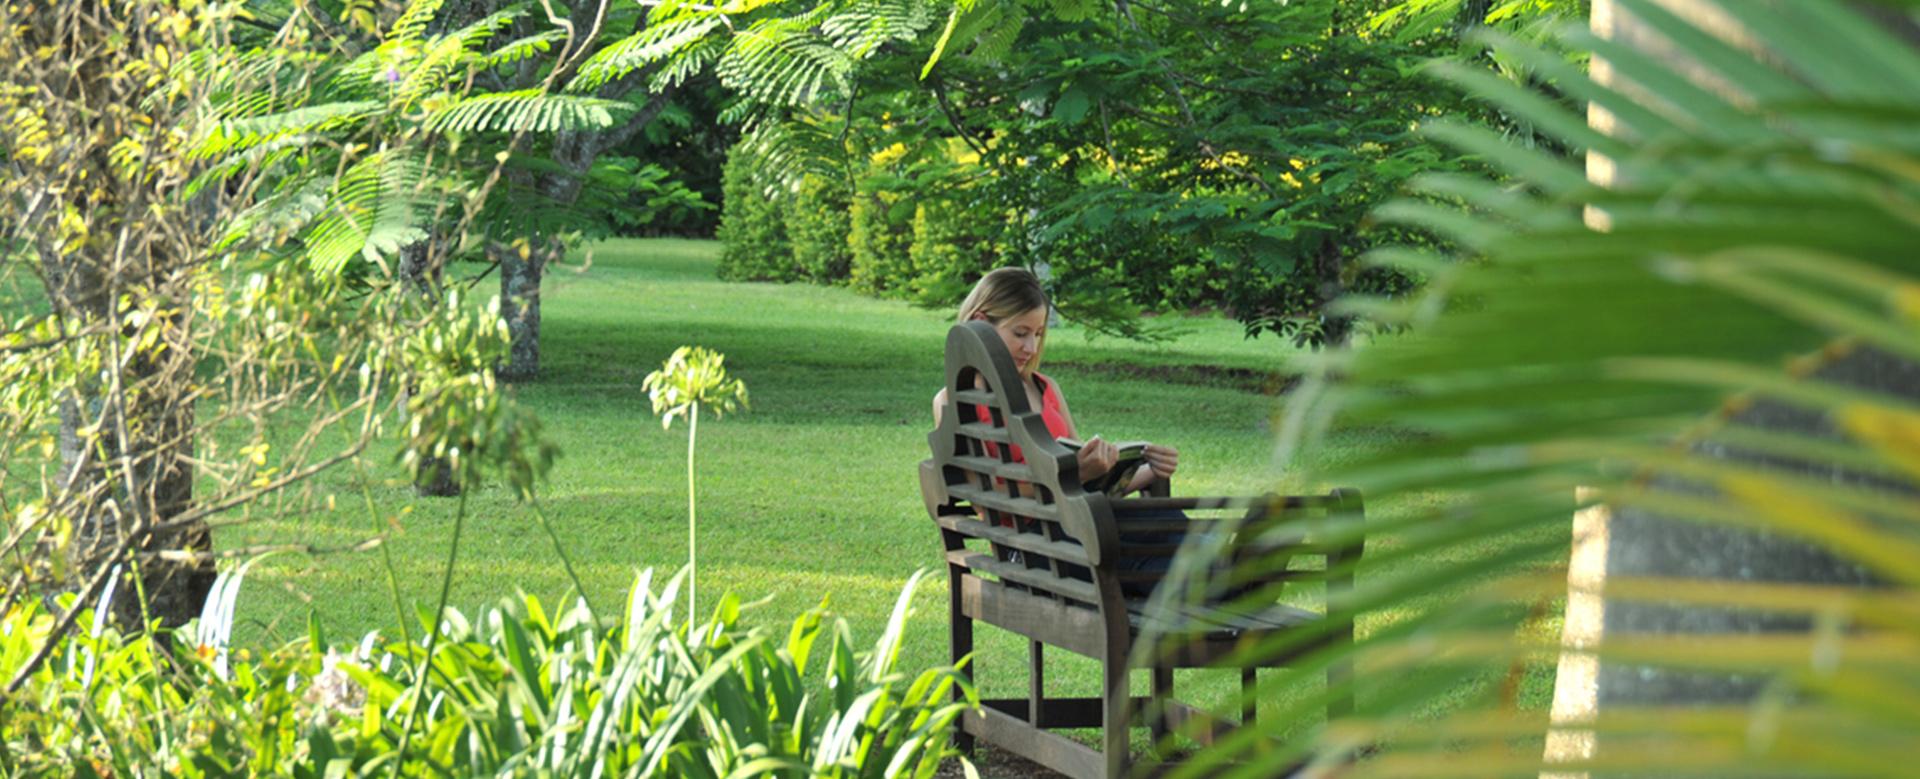 Botanical Garden Summerfield Summerfield